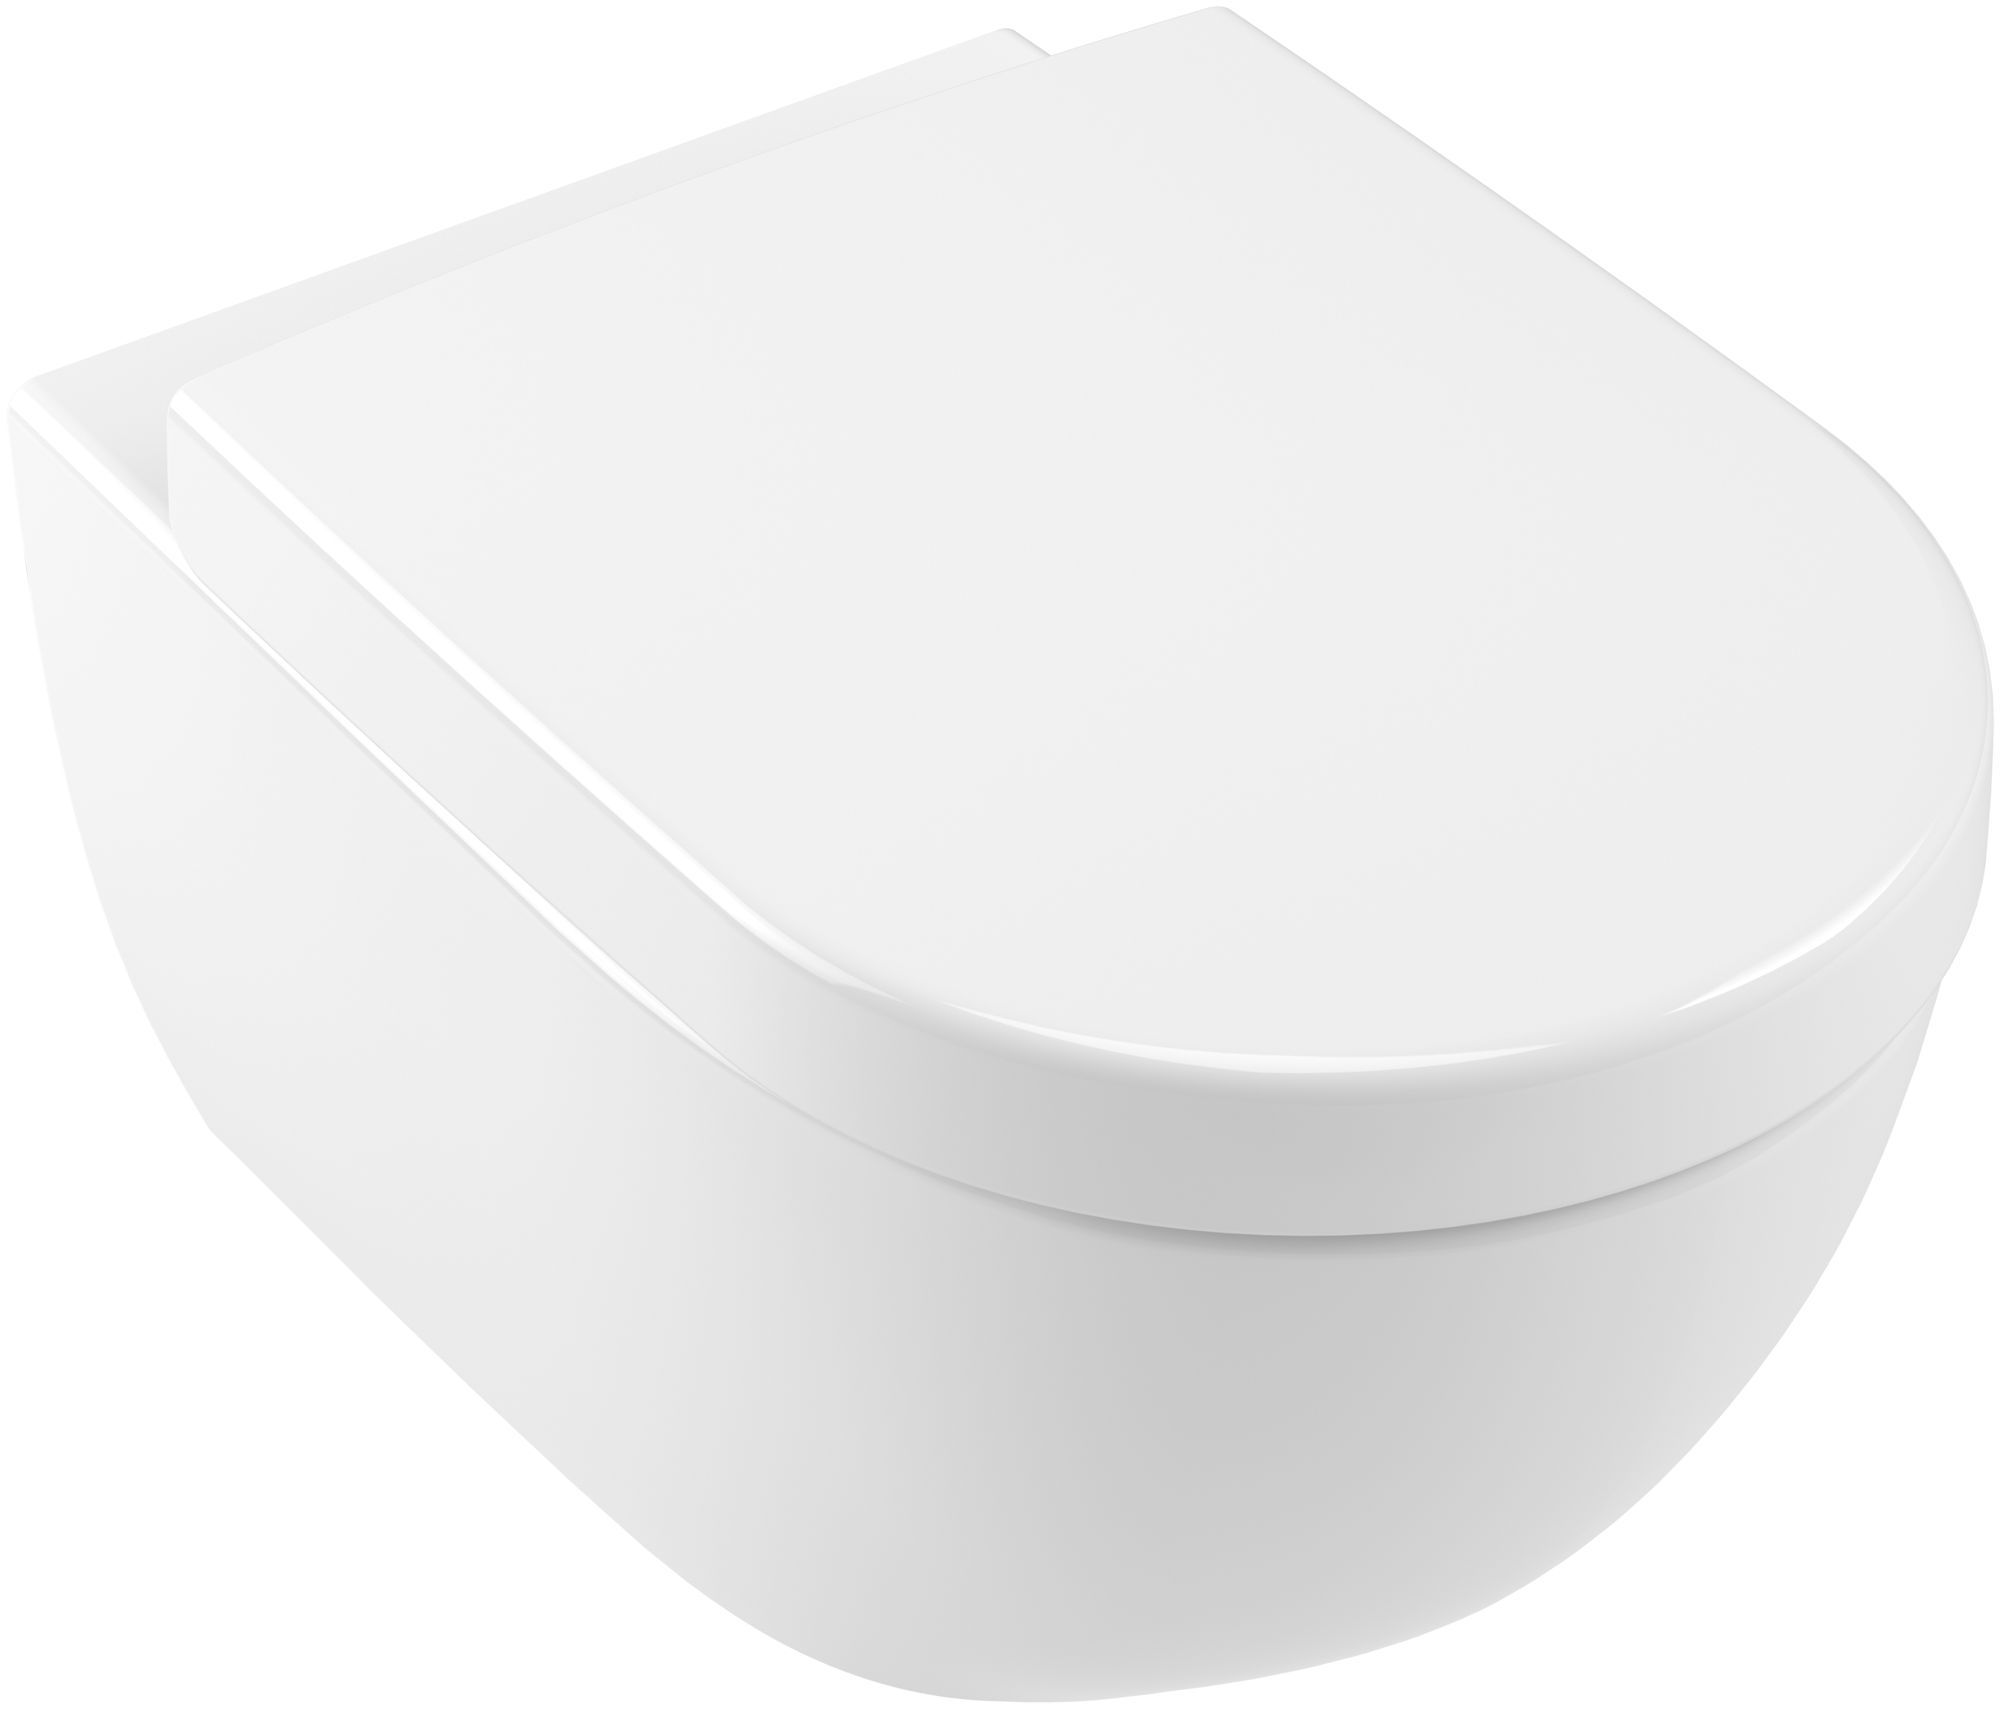 Villeroy & Boch Subway 2.0 Tiefspül-Wand-WC L:56,5xB:37,5cm Weiß Alpin mit Ceramicplus 560010R1